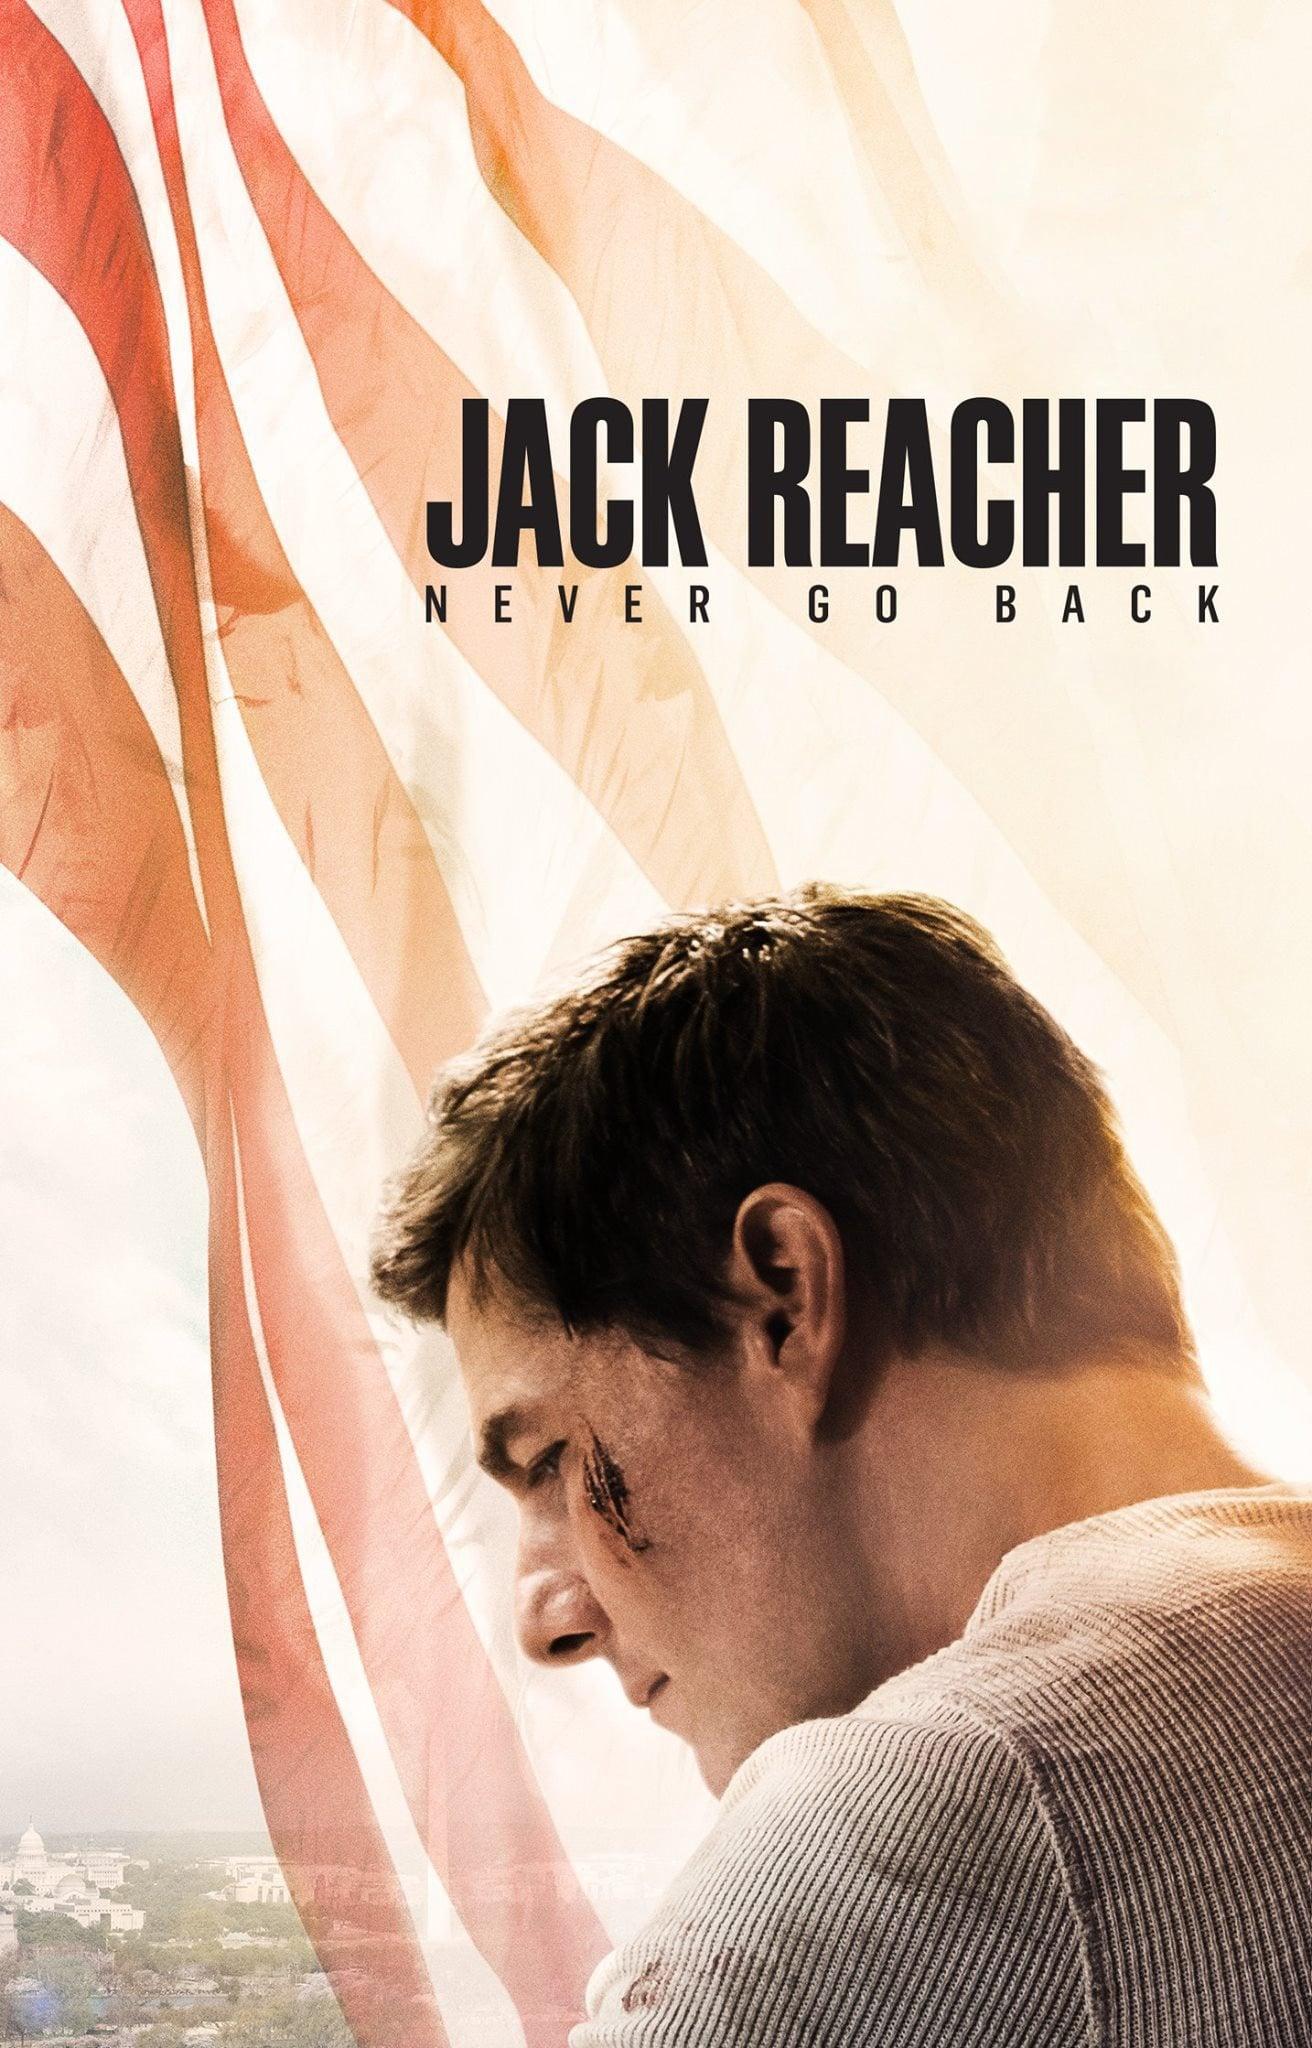 Jack Reacher: Nunca vuelvas atrás